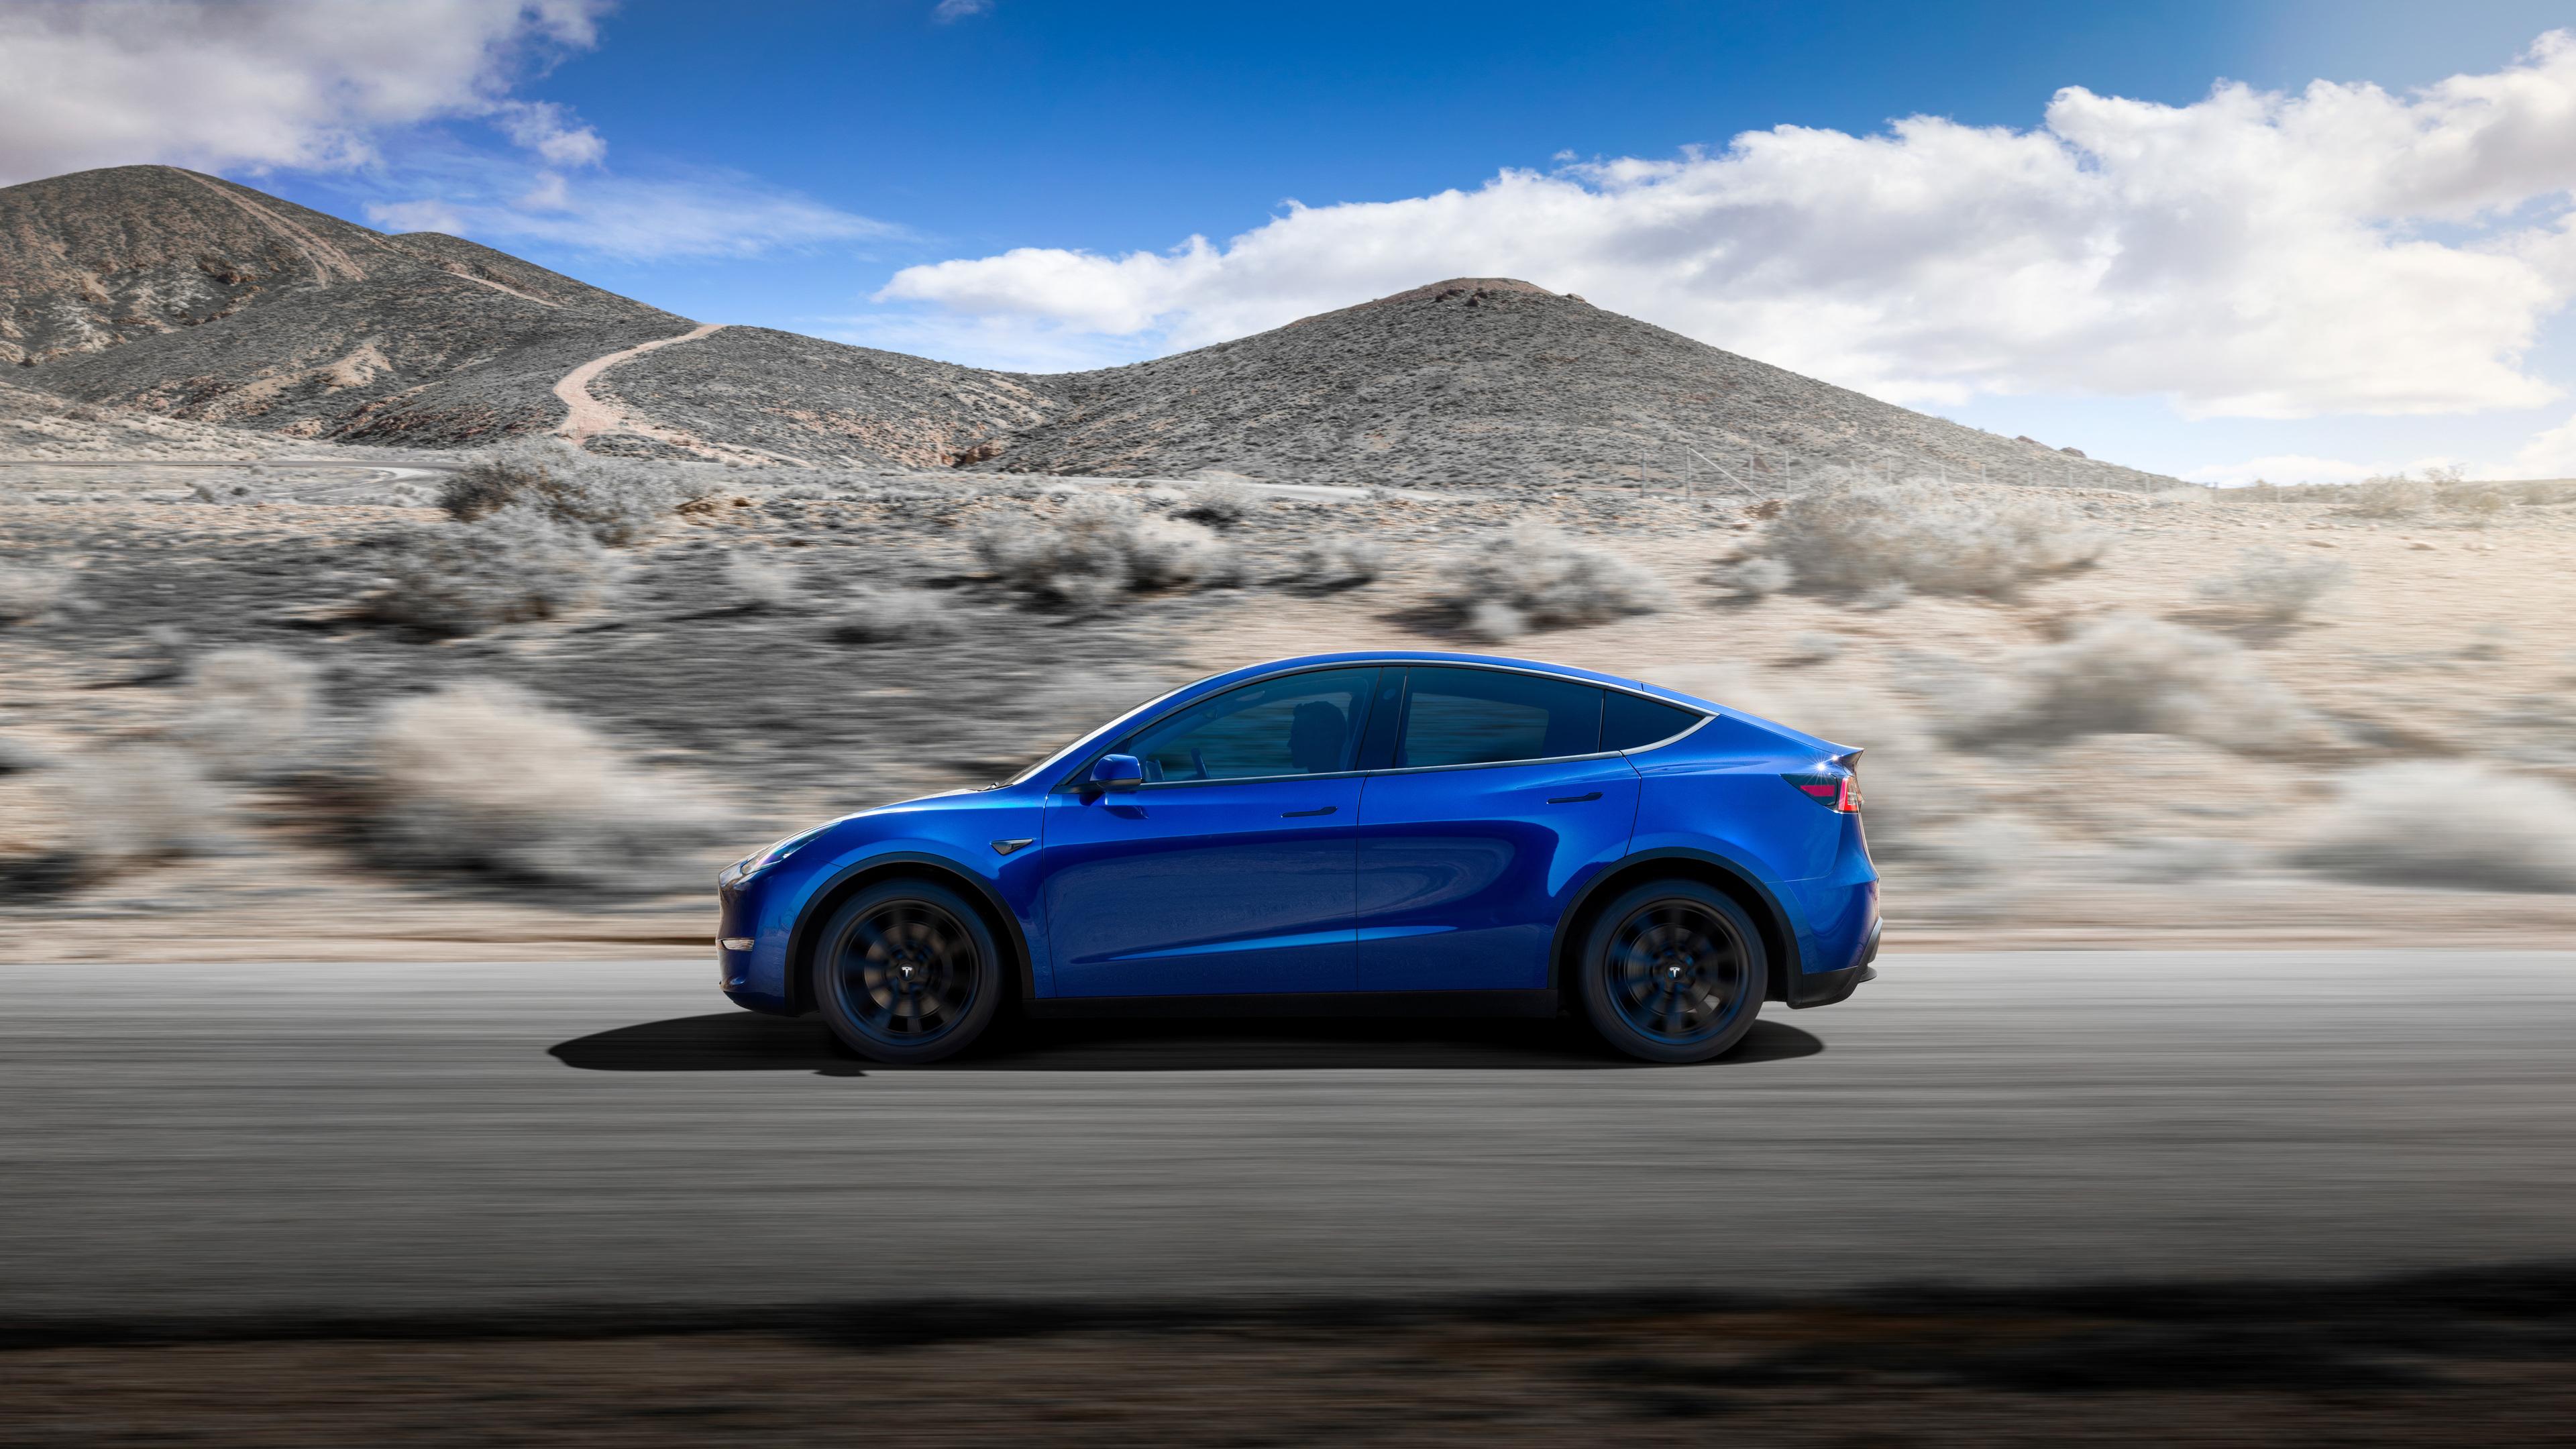 2019 tesla model y side view 4k 1553076268 - 2019 Tesla Model Y Side View 4k - tesla wallpapers, tesla model y wallpapers, hd-wallpapers, cars wallpapers, 8k wallpapers, 5k wallpapers, 4k-wallpapers, 2019 cars wallpapers, 10k wallpapers